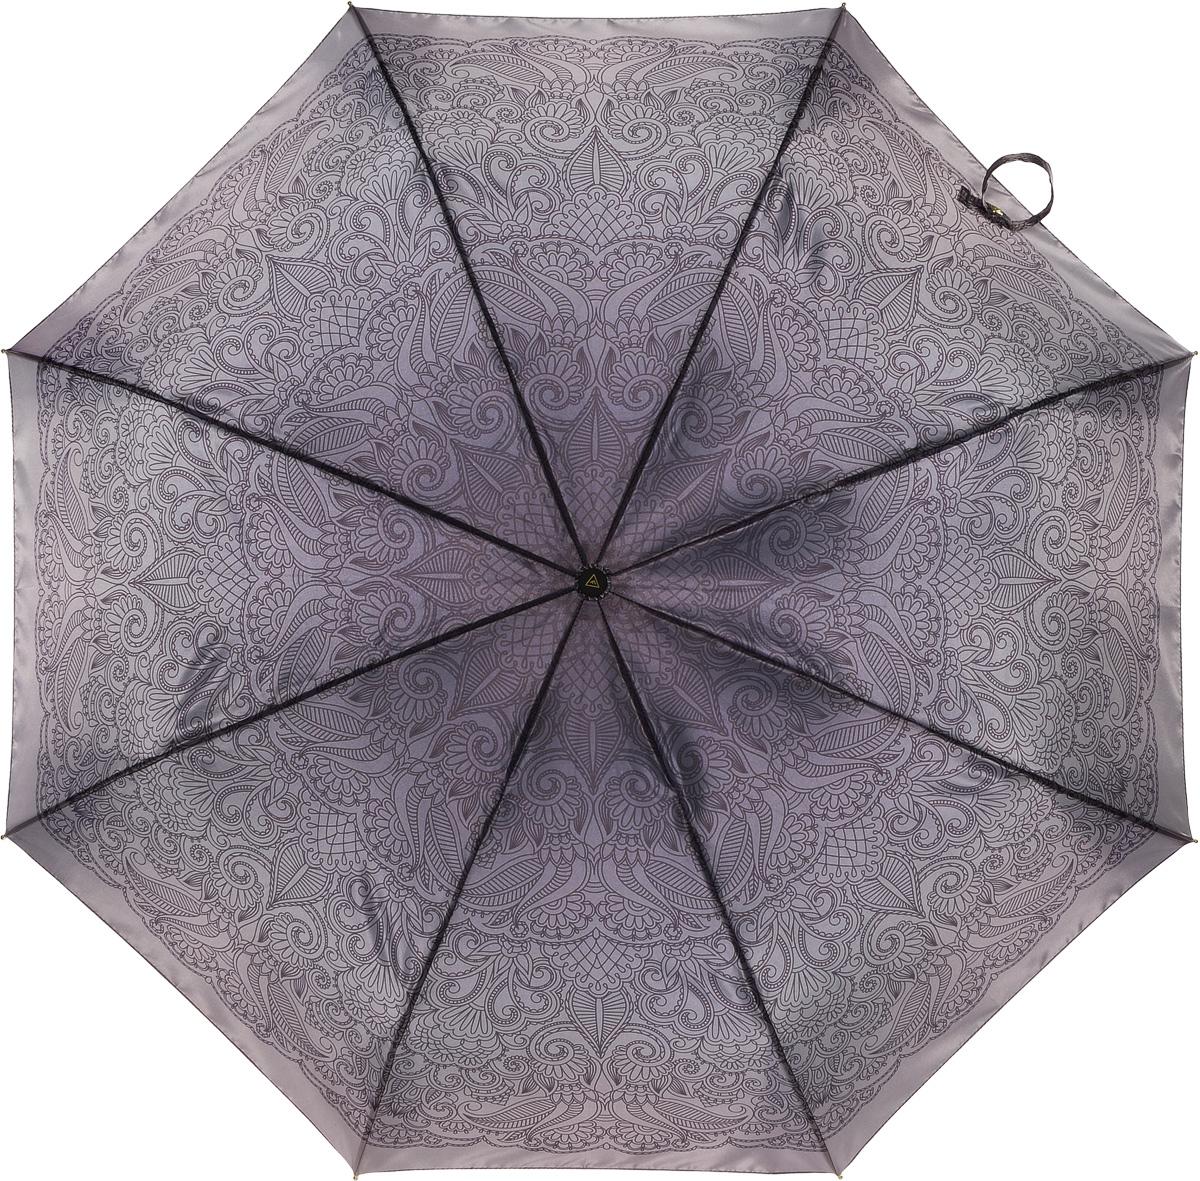 Зонт женский Fabretti, автомат, 3 сложения. L-16107-25L-16107-25Зонт женский Fabretti, облегченный суперавтомат, 3 сложения